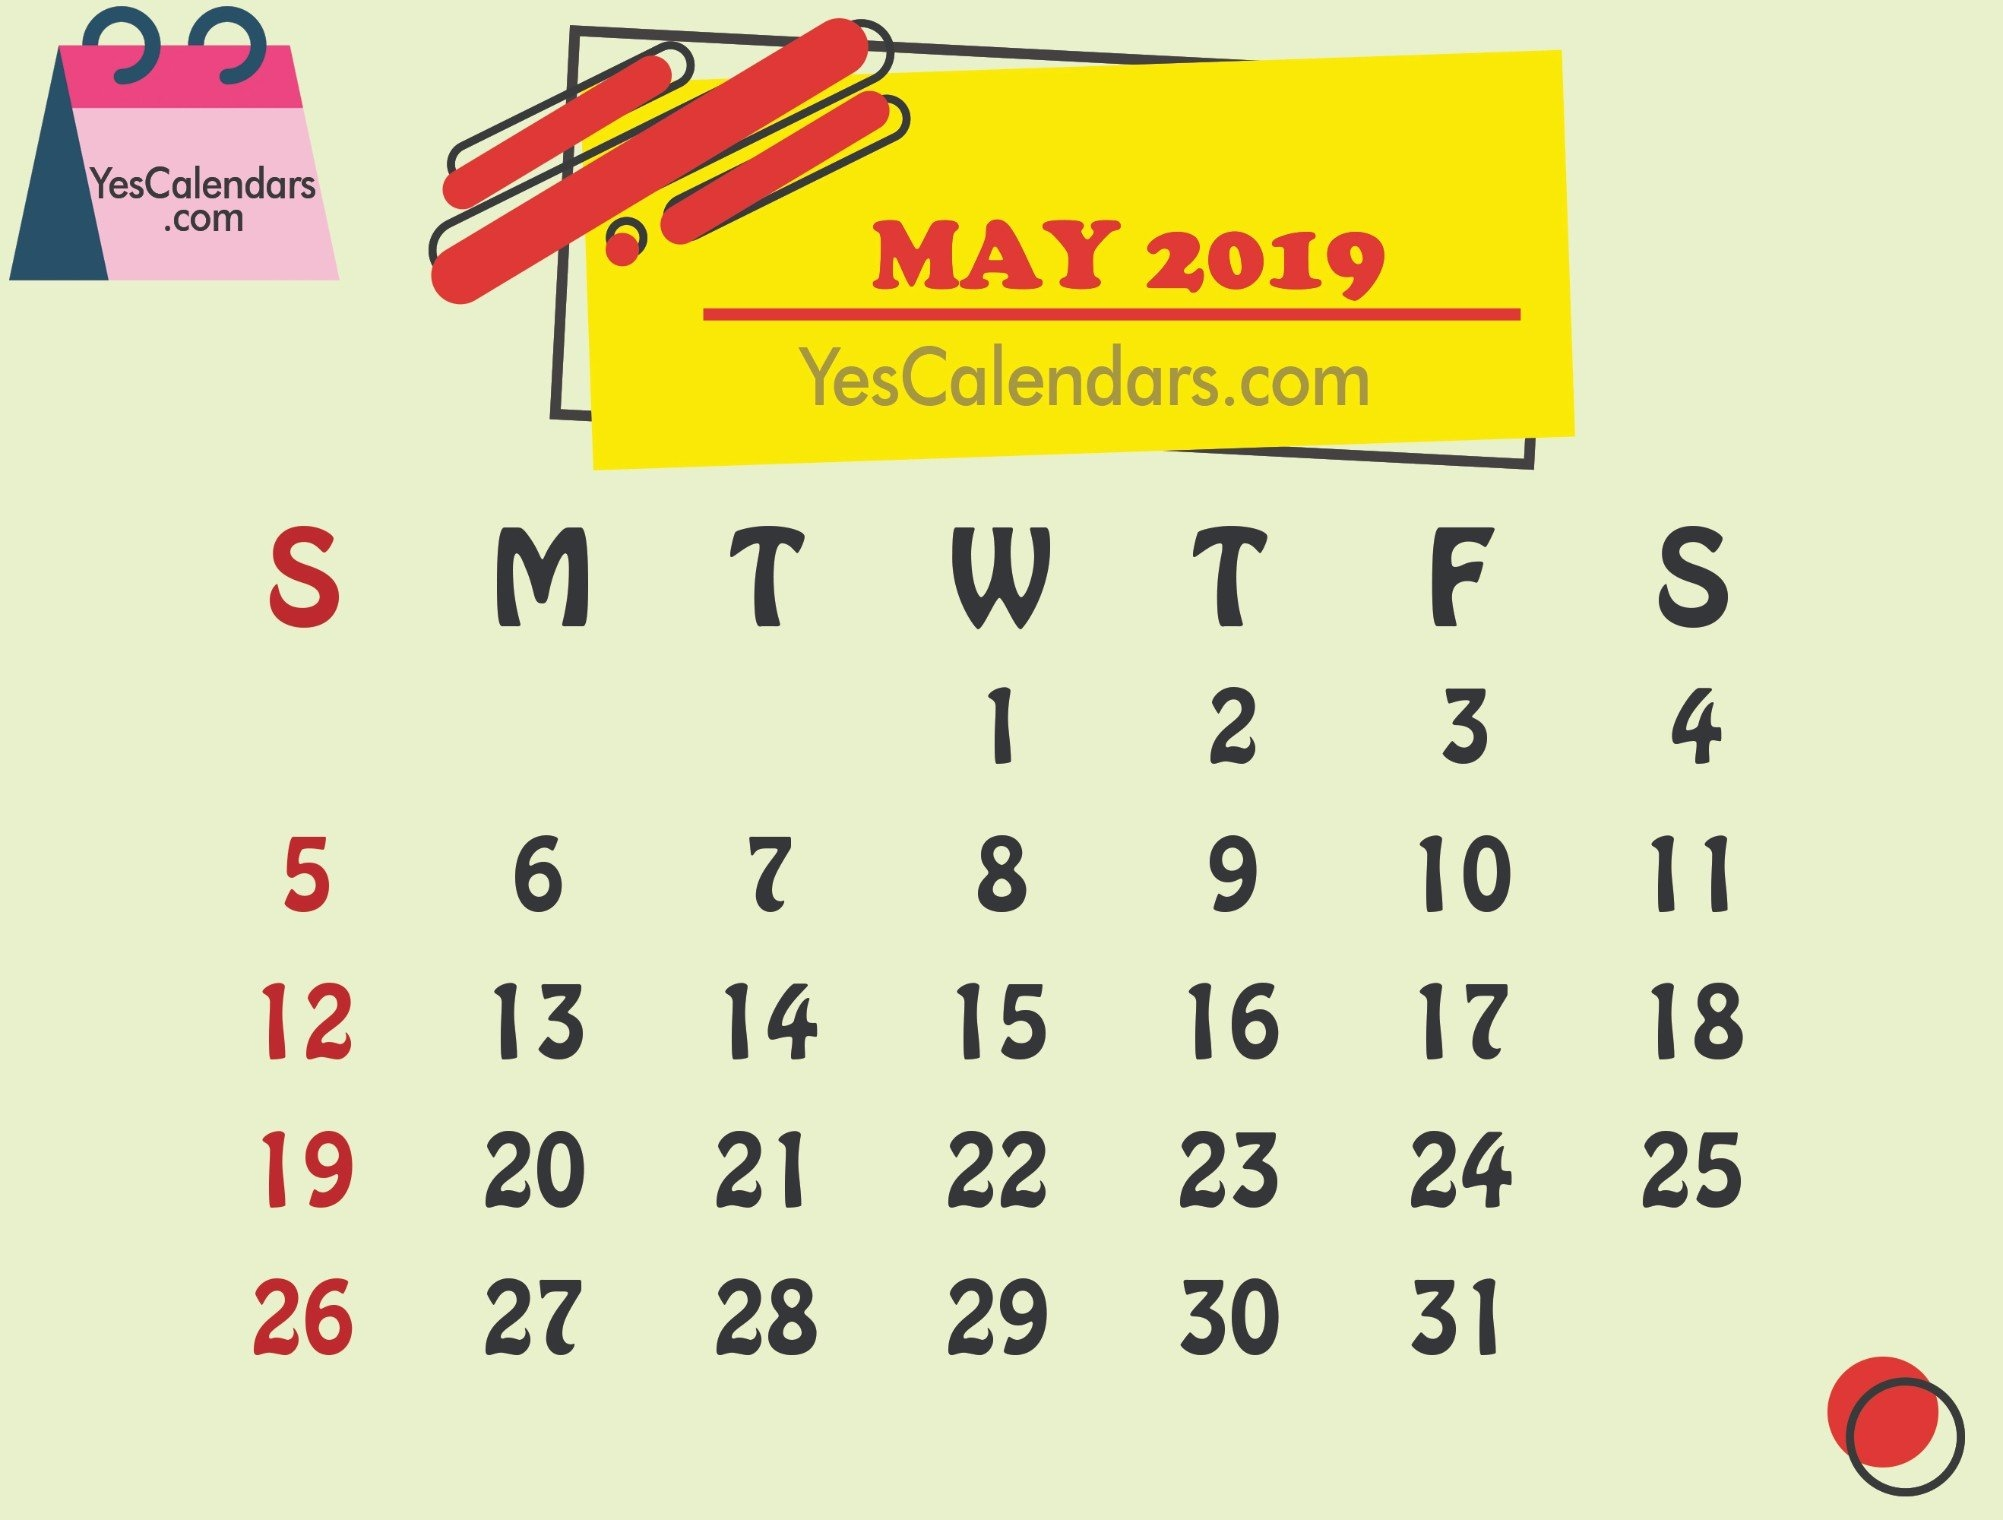 Printable May 2019 Calendar Template Holidays - Yes Calendars May 5 2019 Calendar